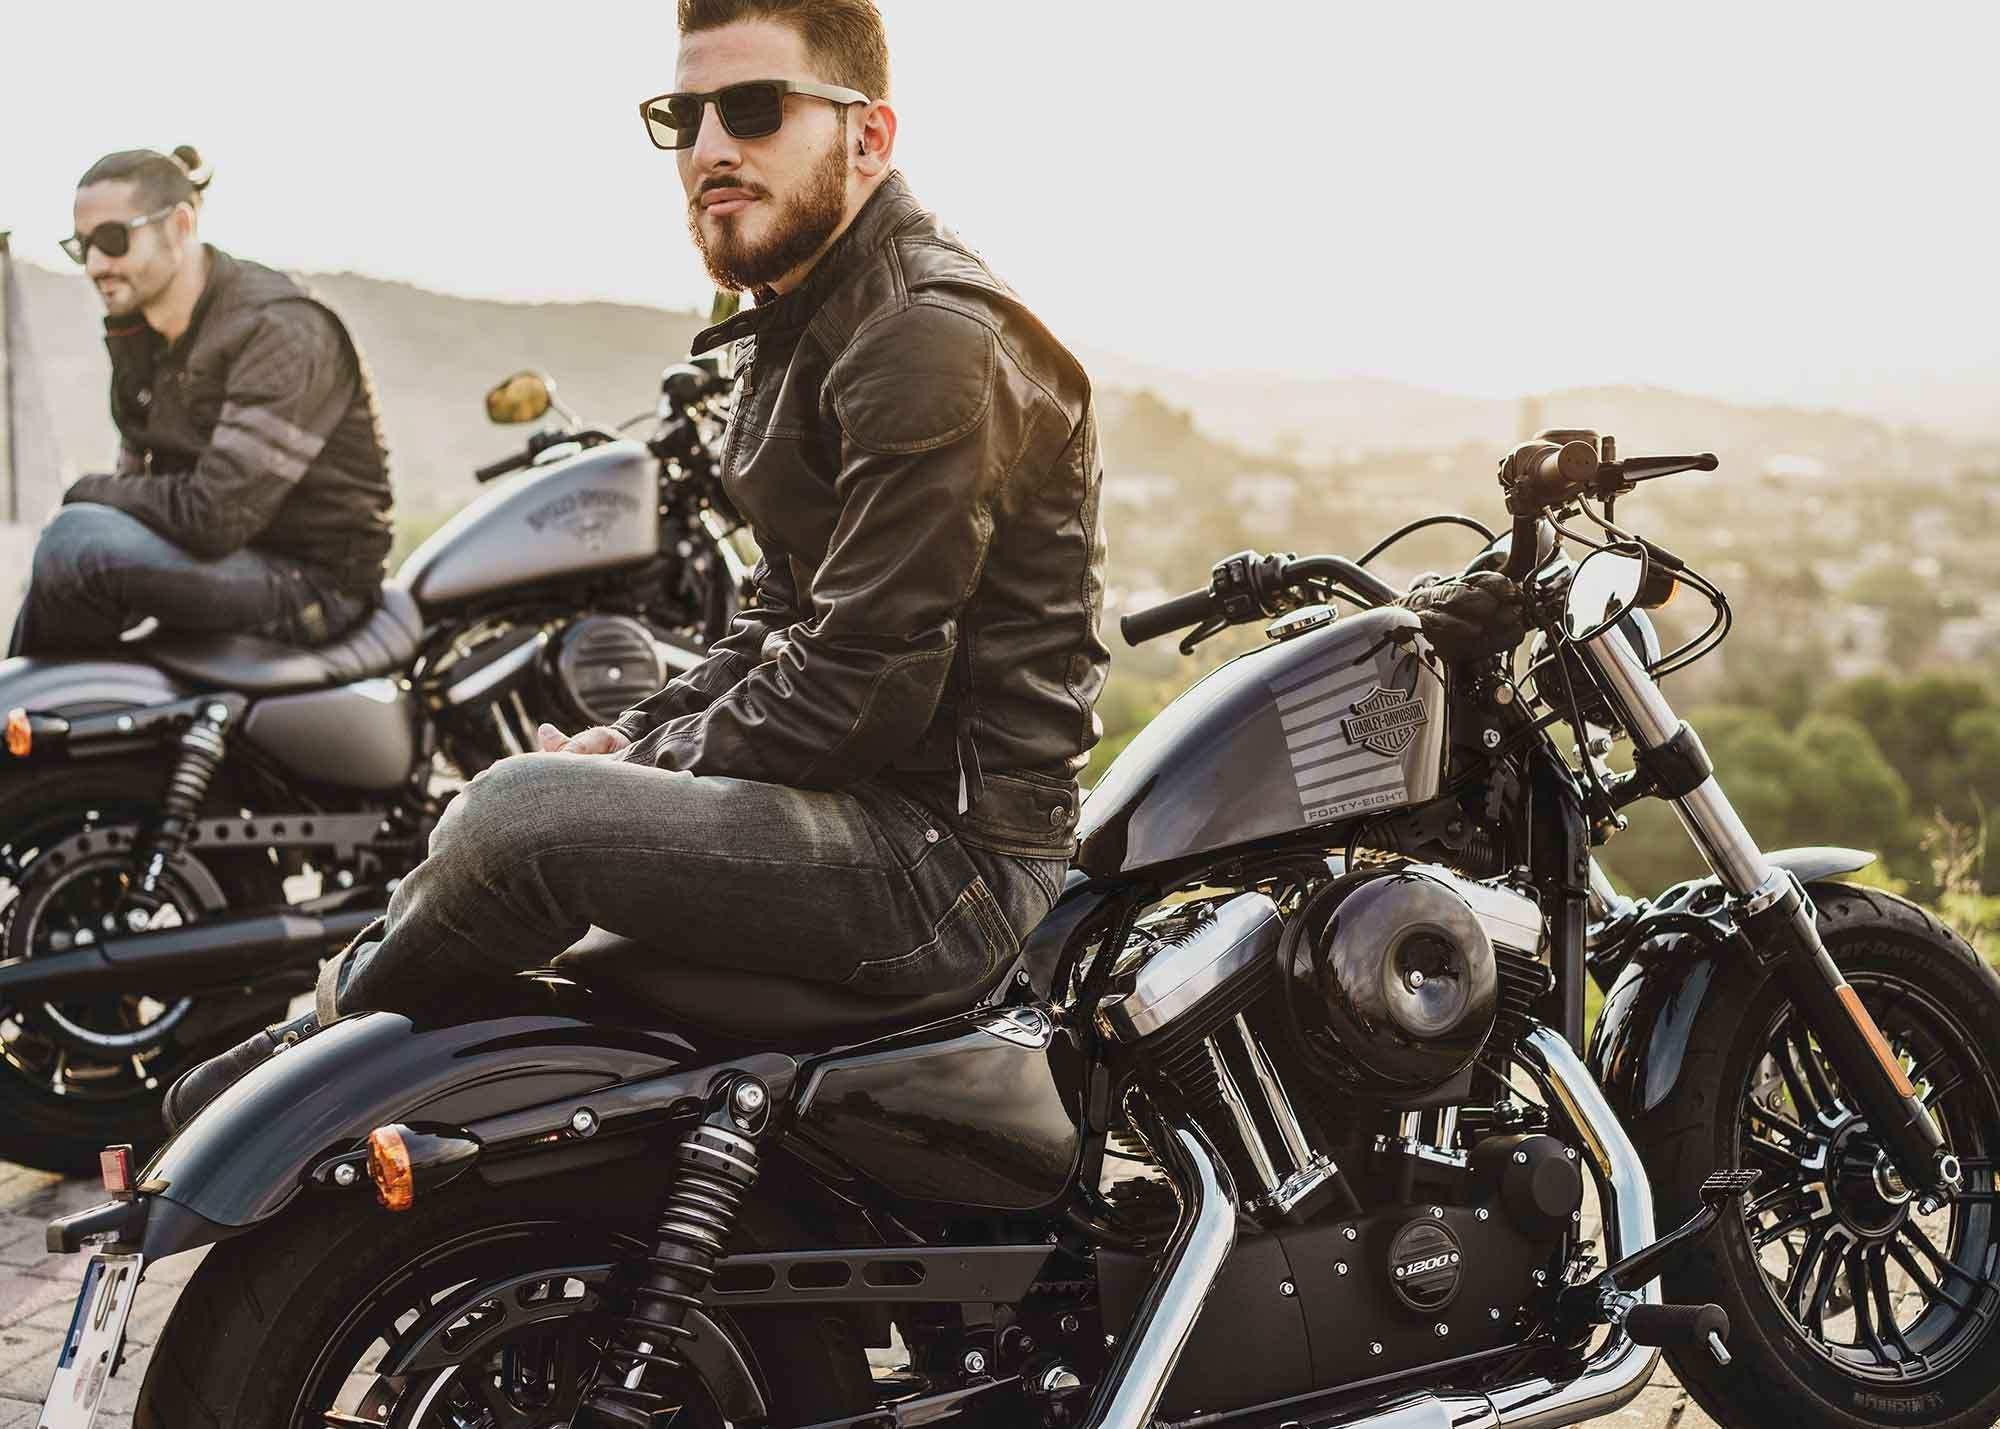 Men sitting on Harley bikes